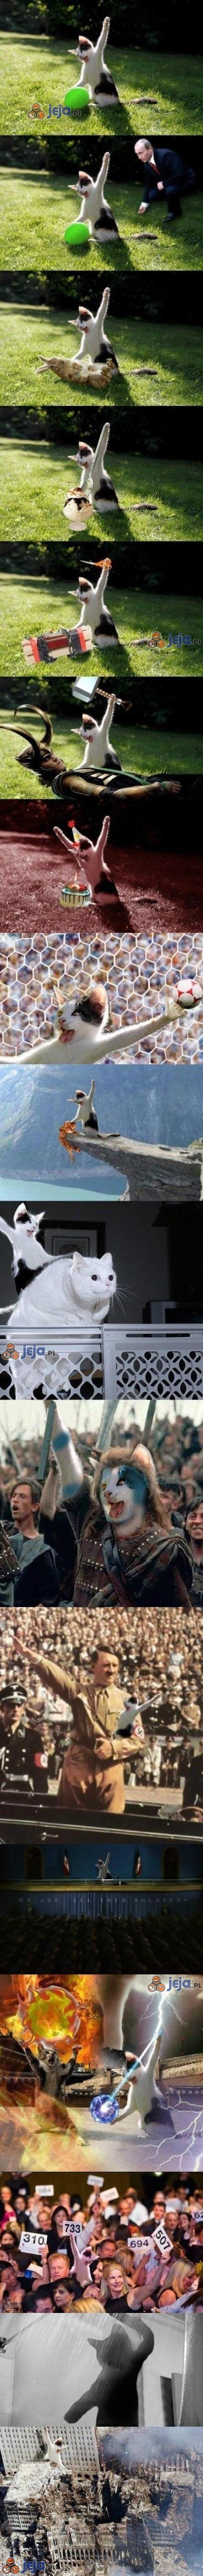 Przeróbka kota z balonem cz.2